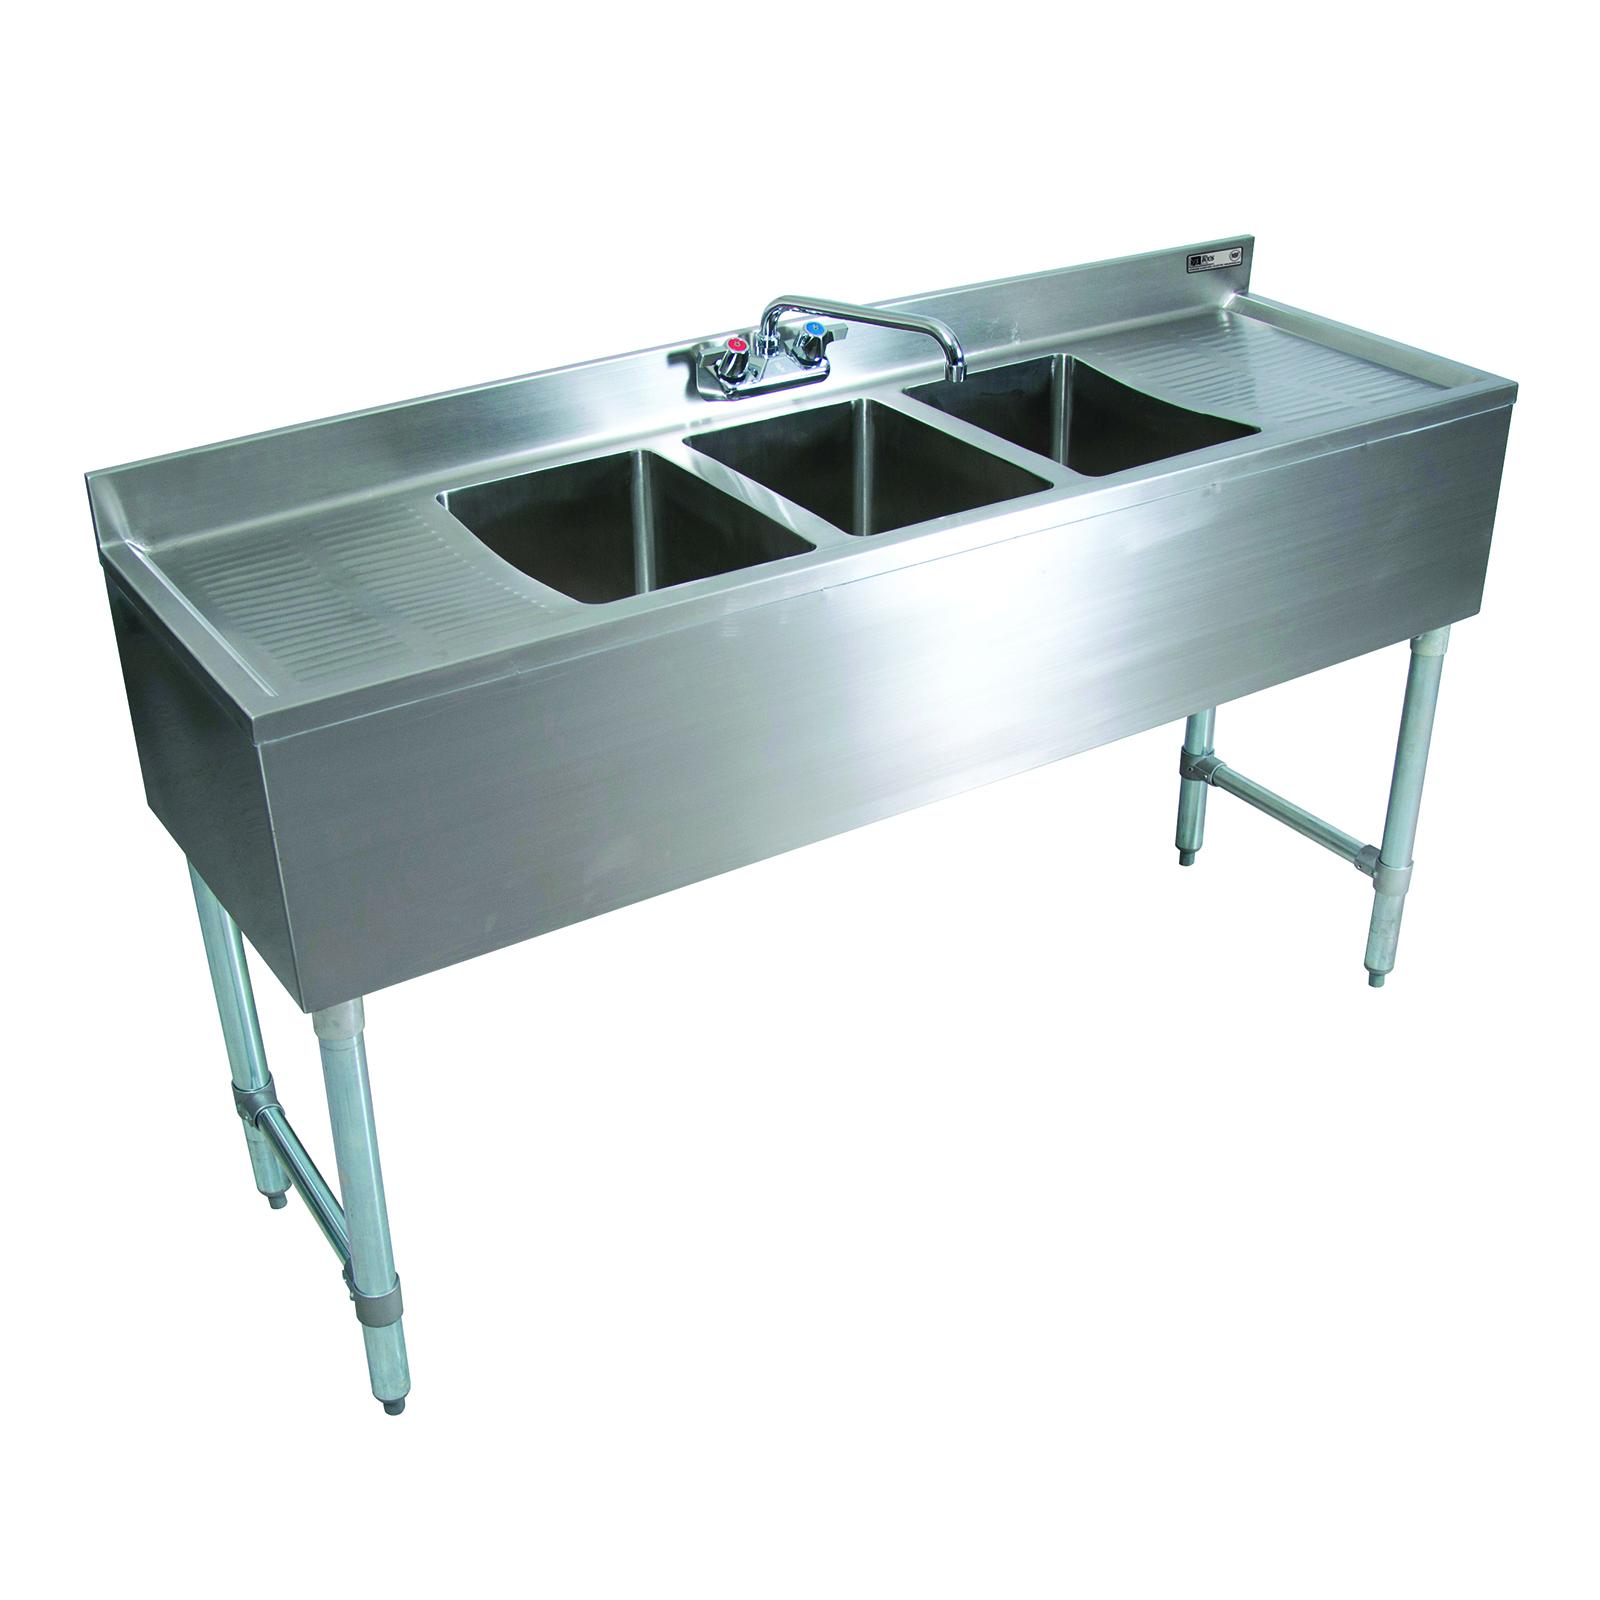 John Boos EUB3S60SL-1RD underbar sink units